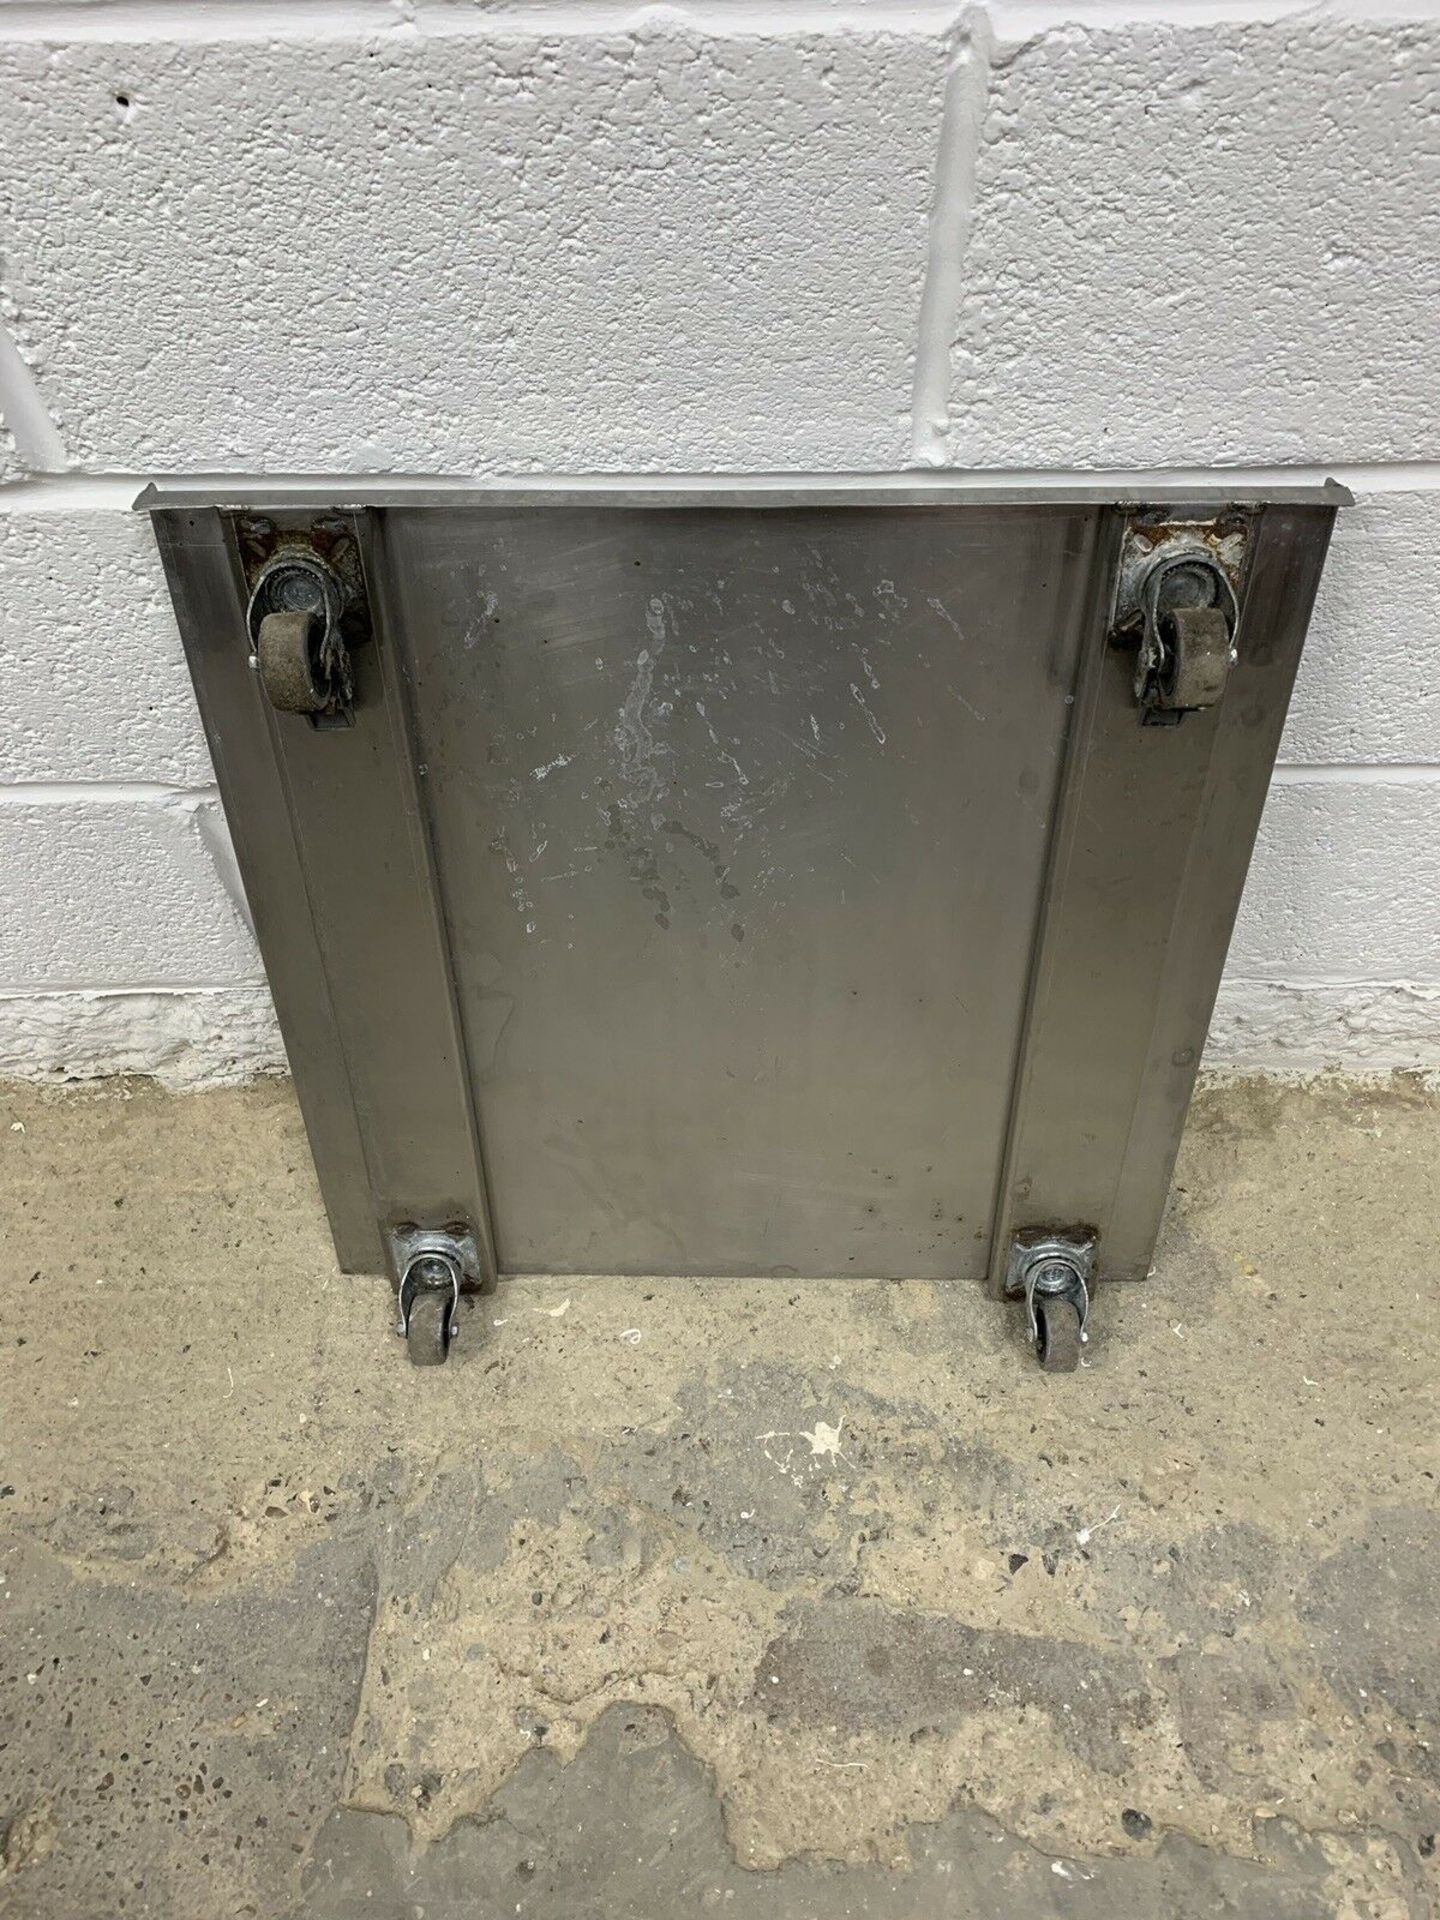 Lot 98 - Stainless Steel Dishwasher / Appliance Trolley